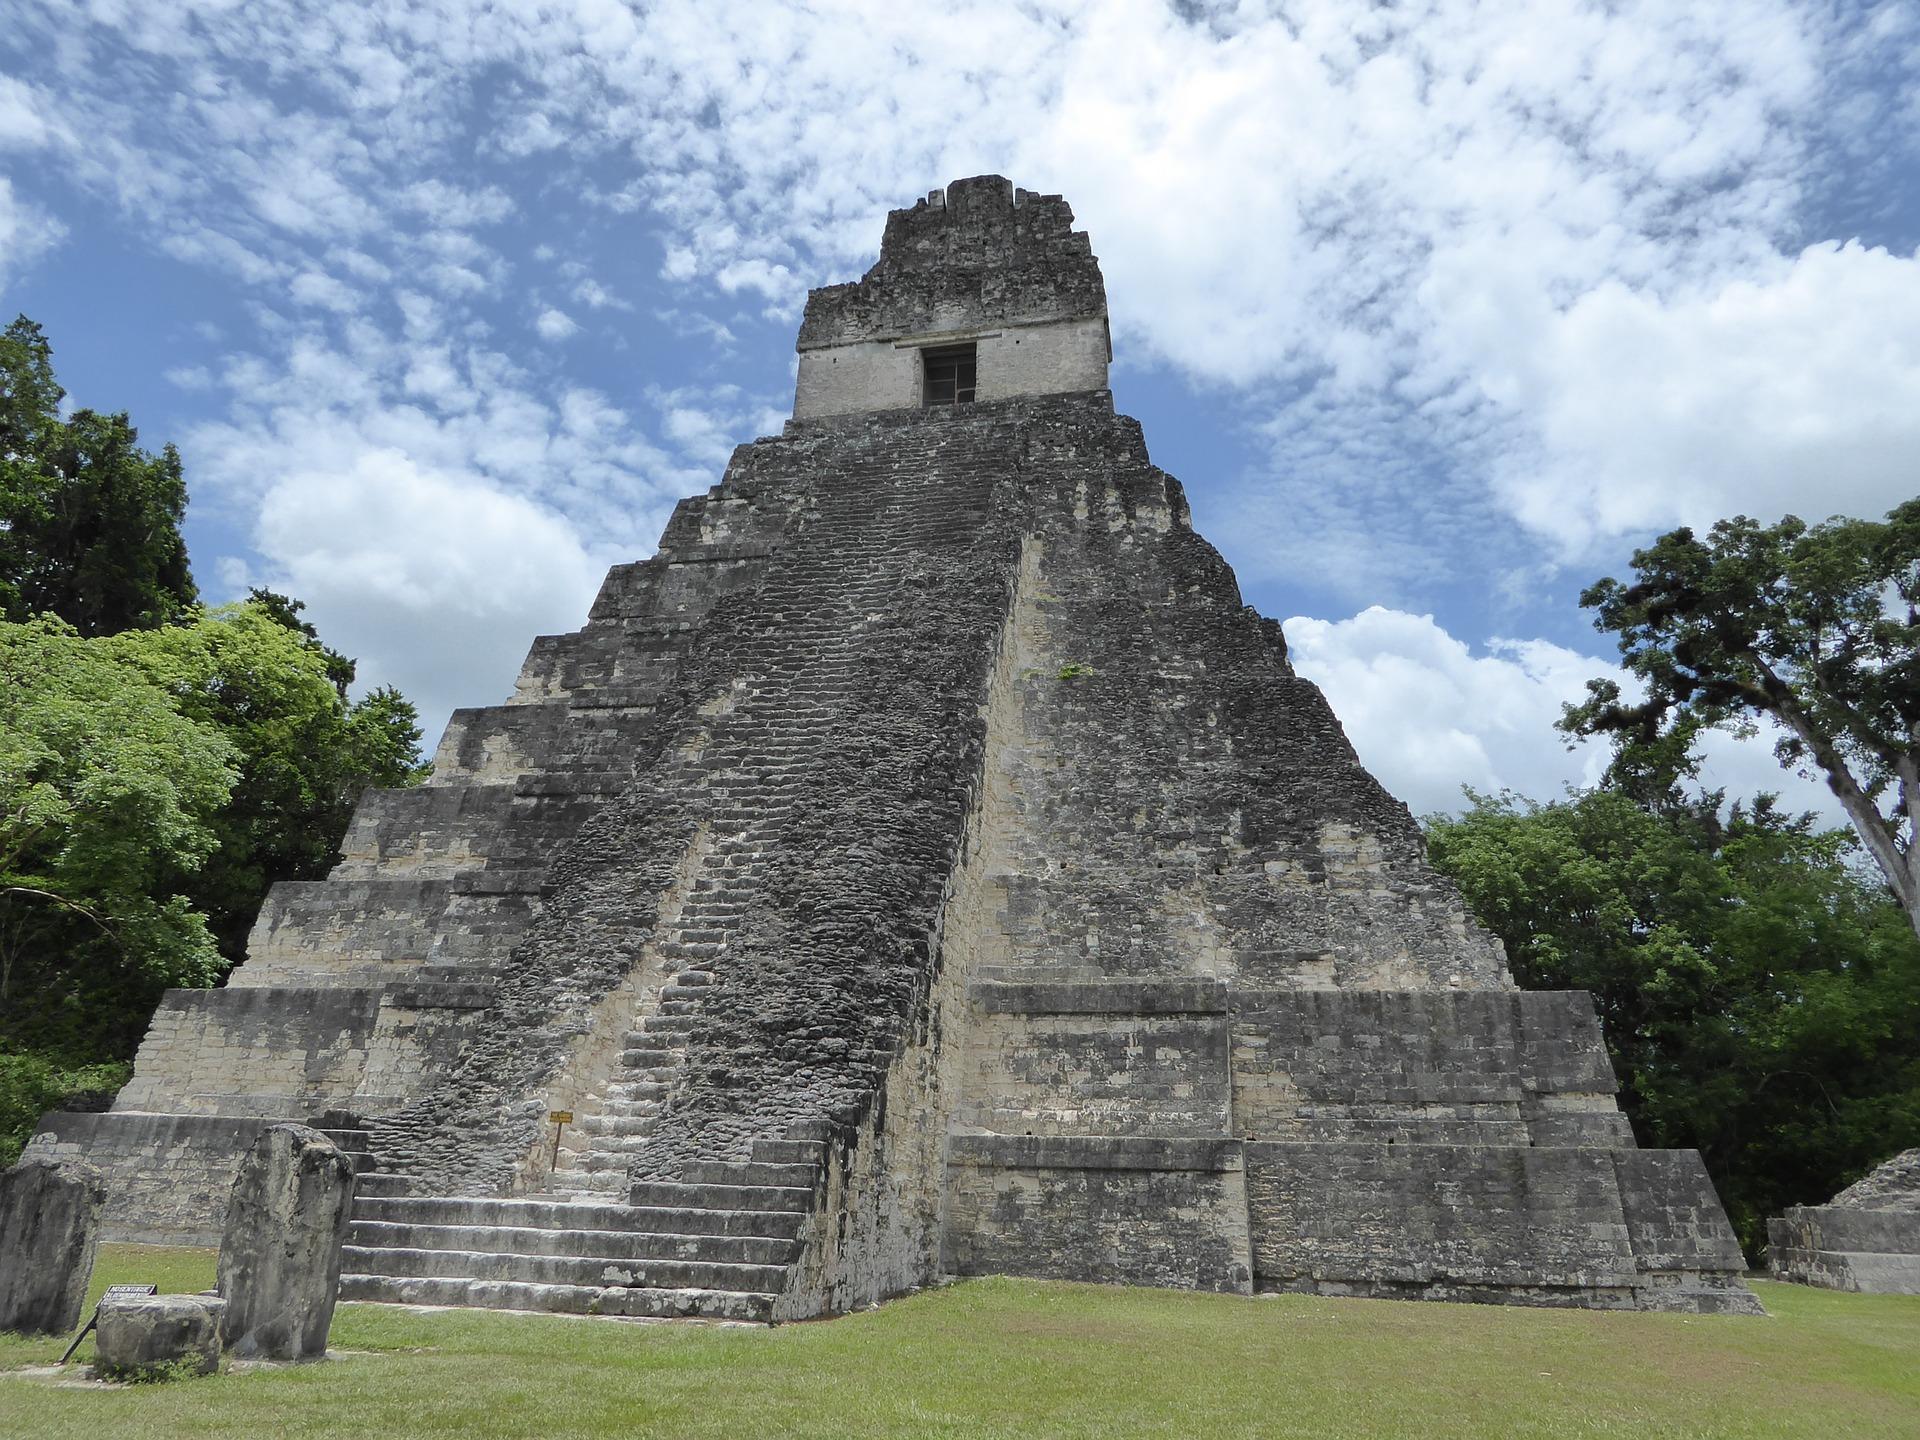 pyramid-tikal-ruins.jpg